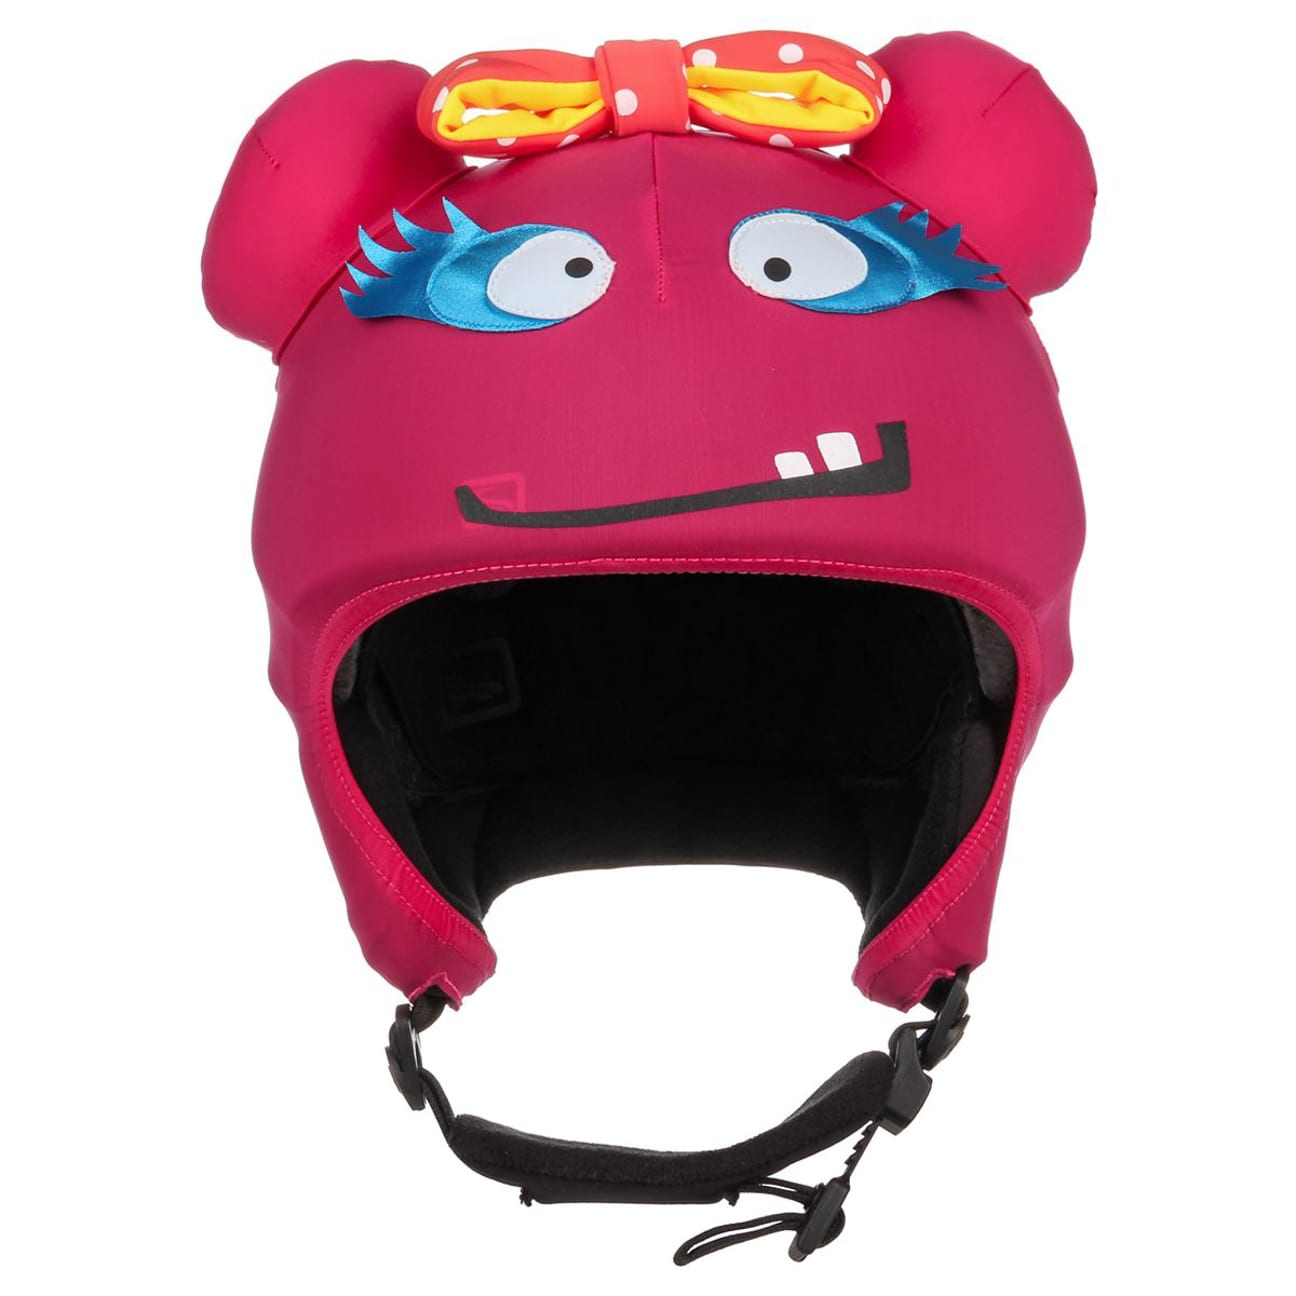 ... Sweetie Ski Helmet Cover by Barts - pink 1 e524988da5b